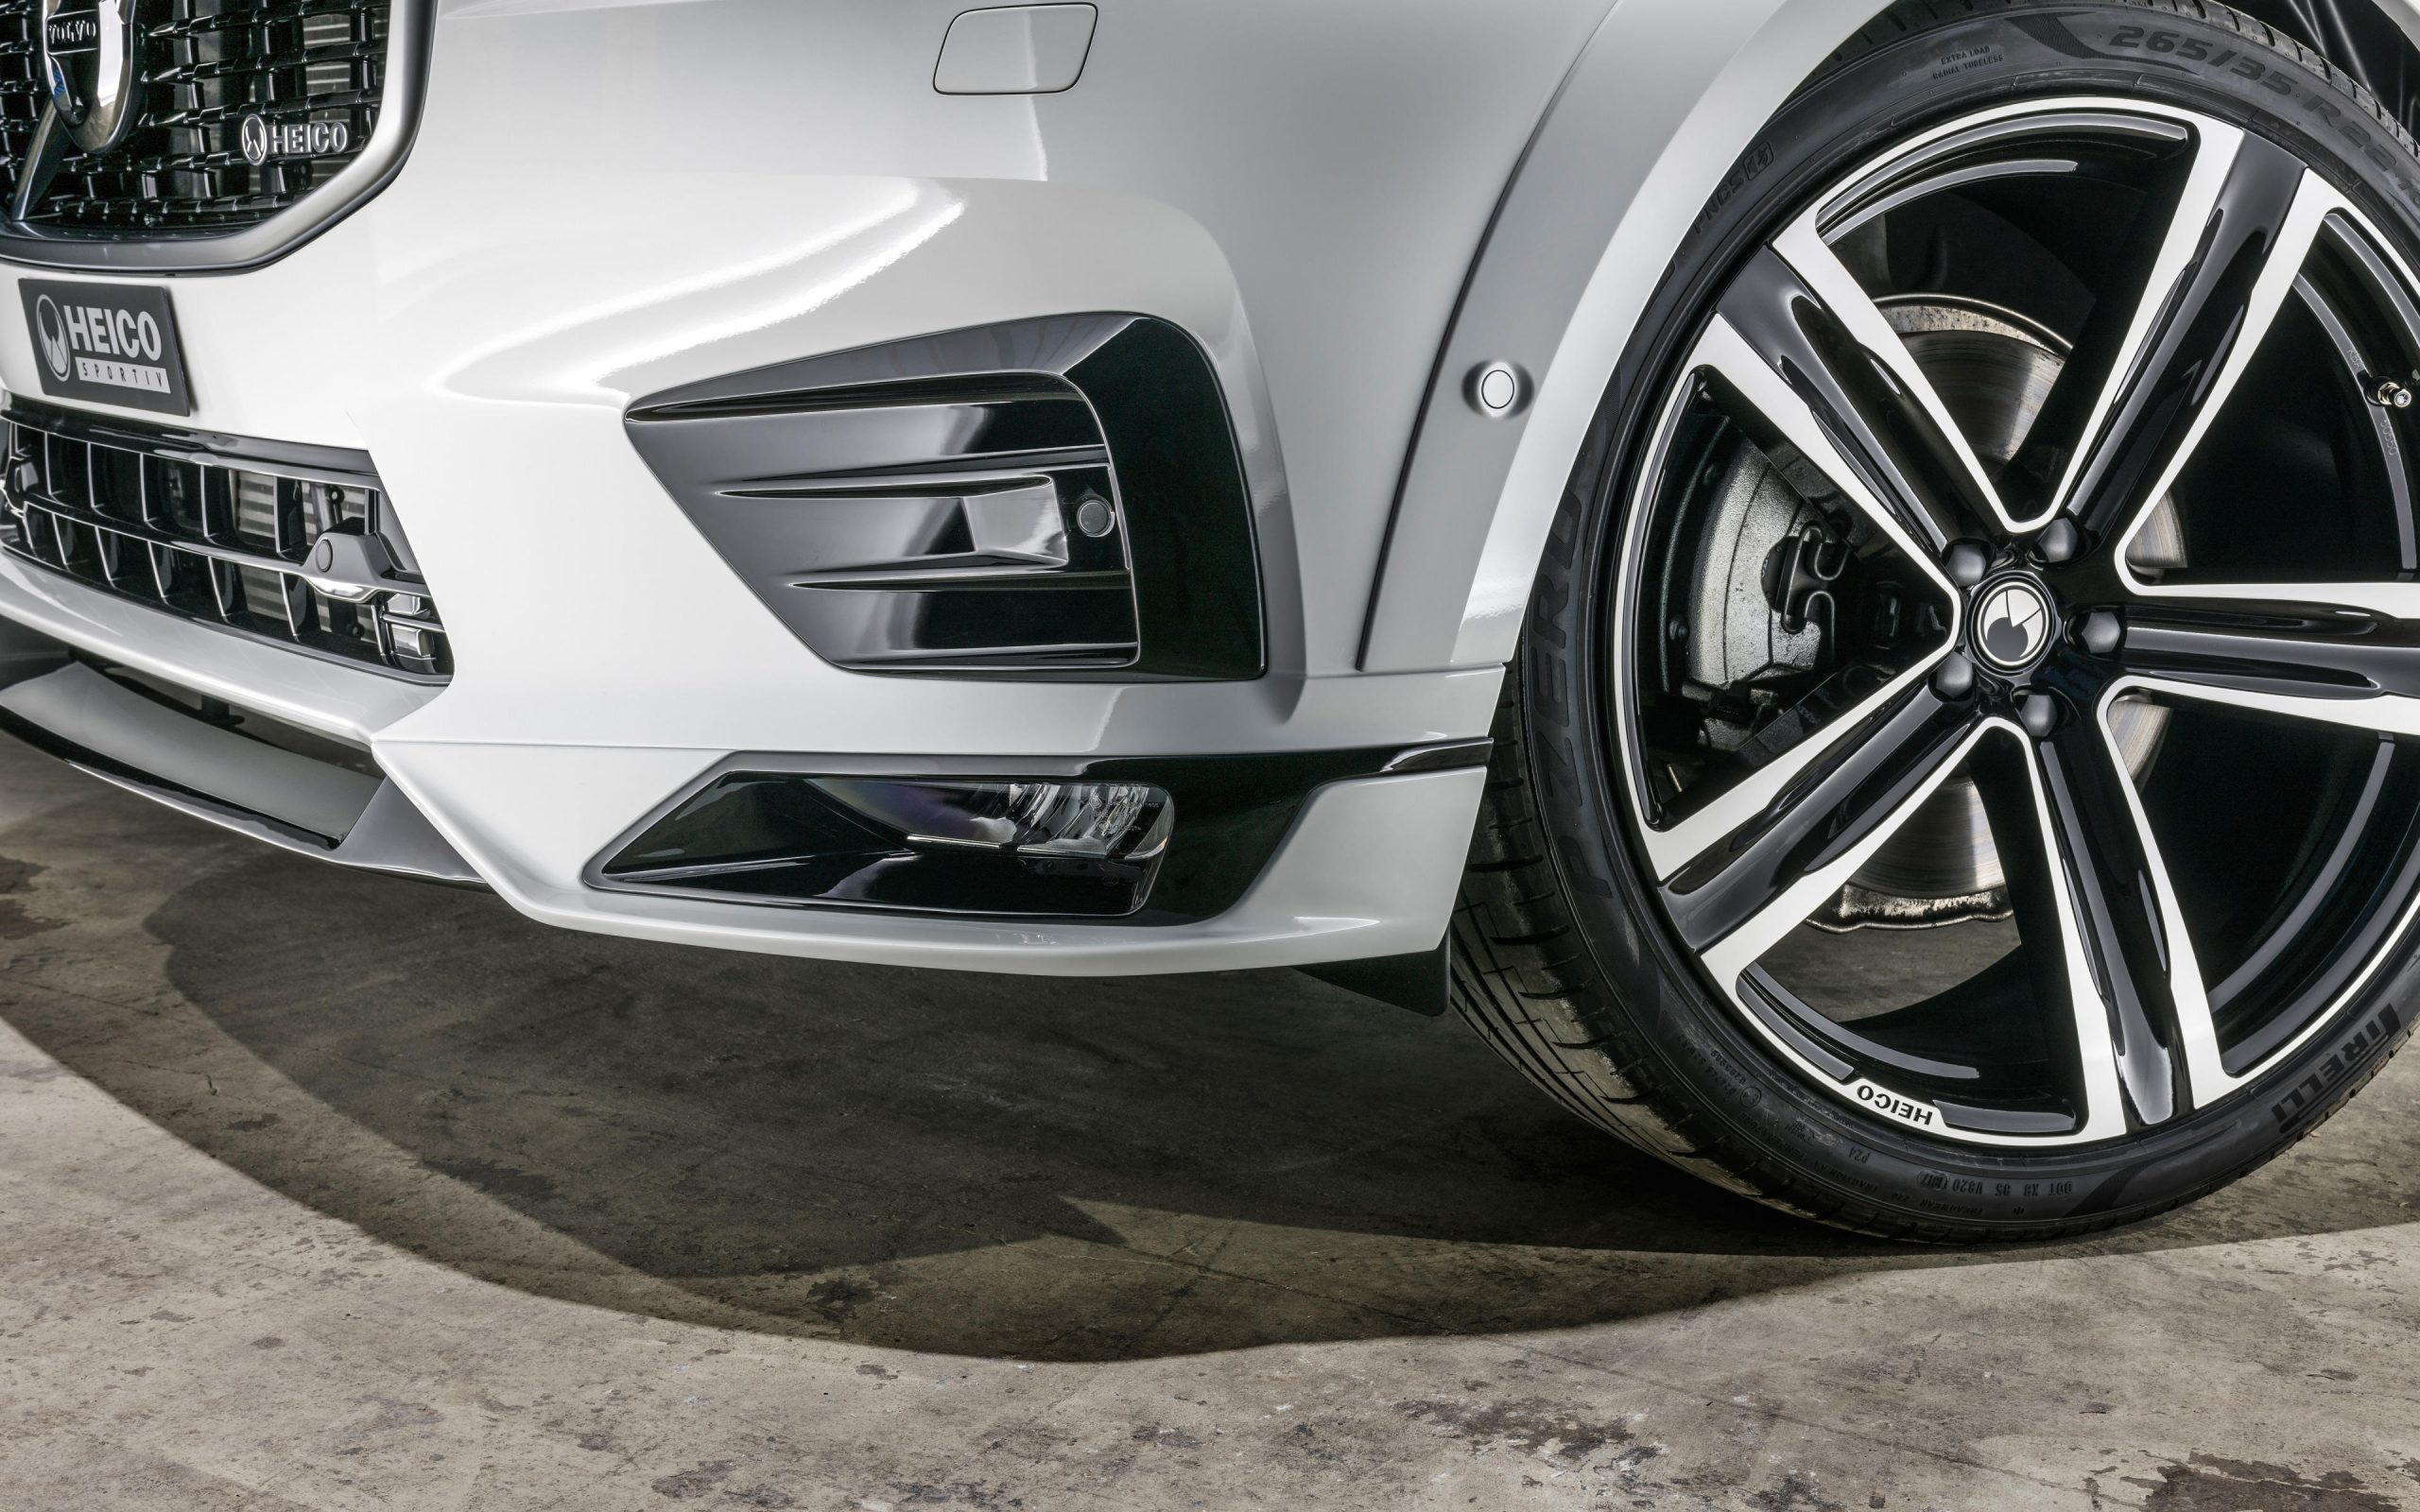 heico-sportiv-volvo-xc60-246-front-detail-1